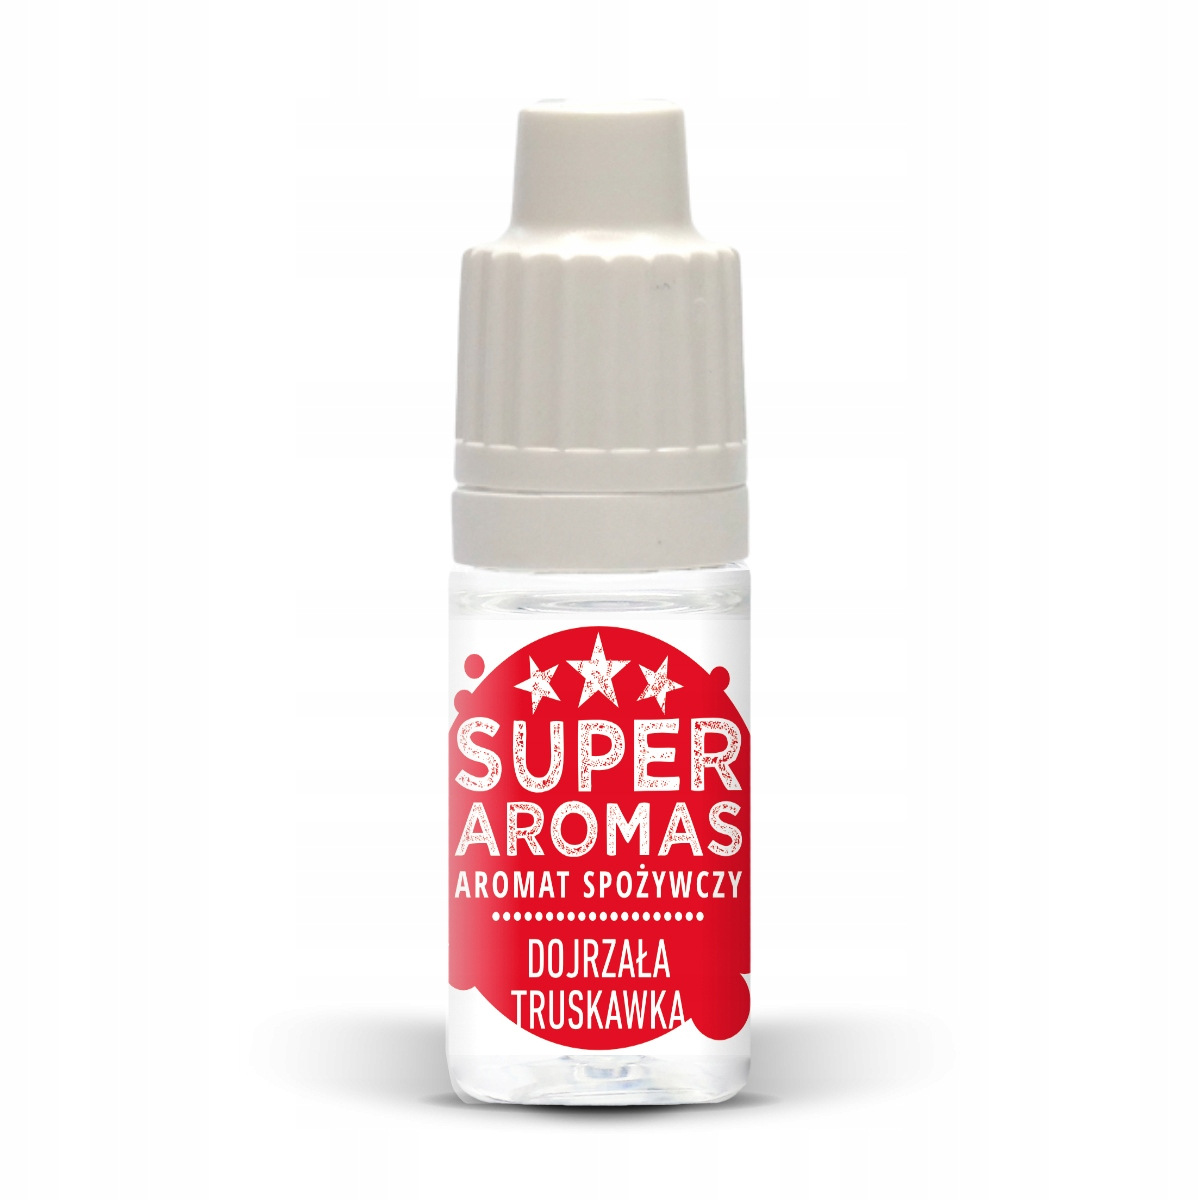 SUPER AROMAS aromat dojrzała truskawka 10 ml